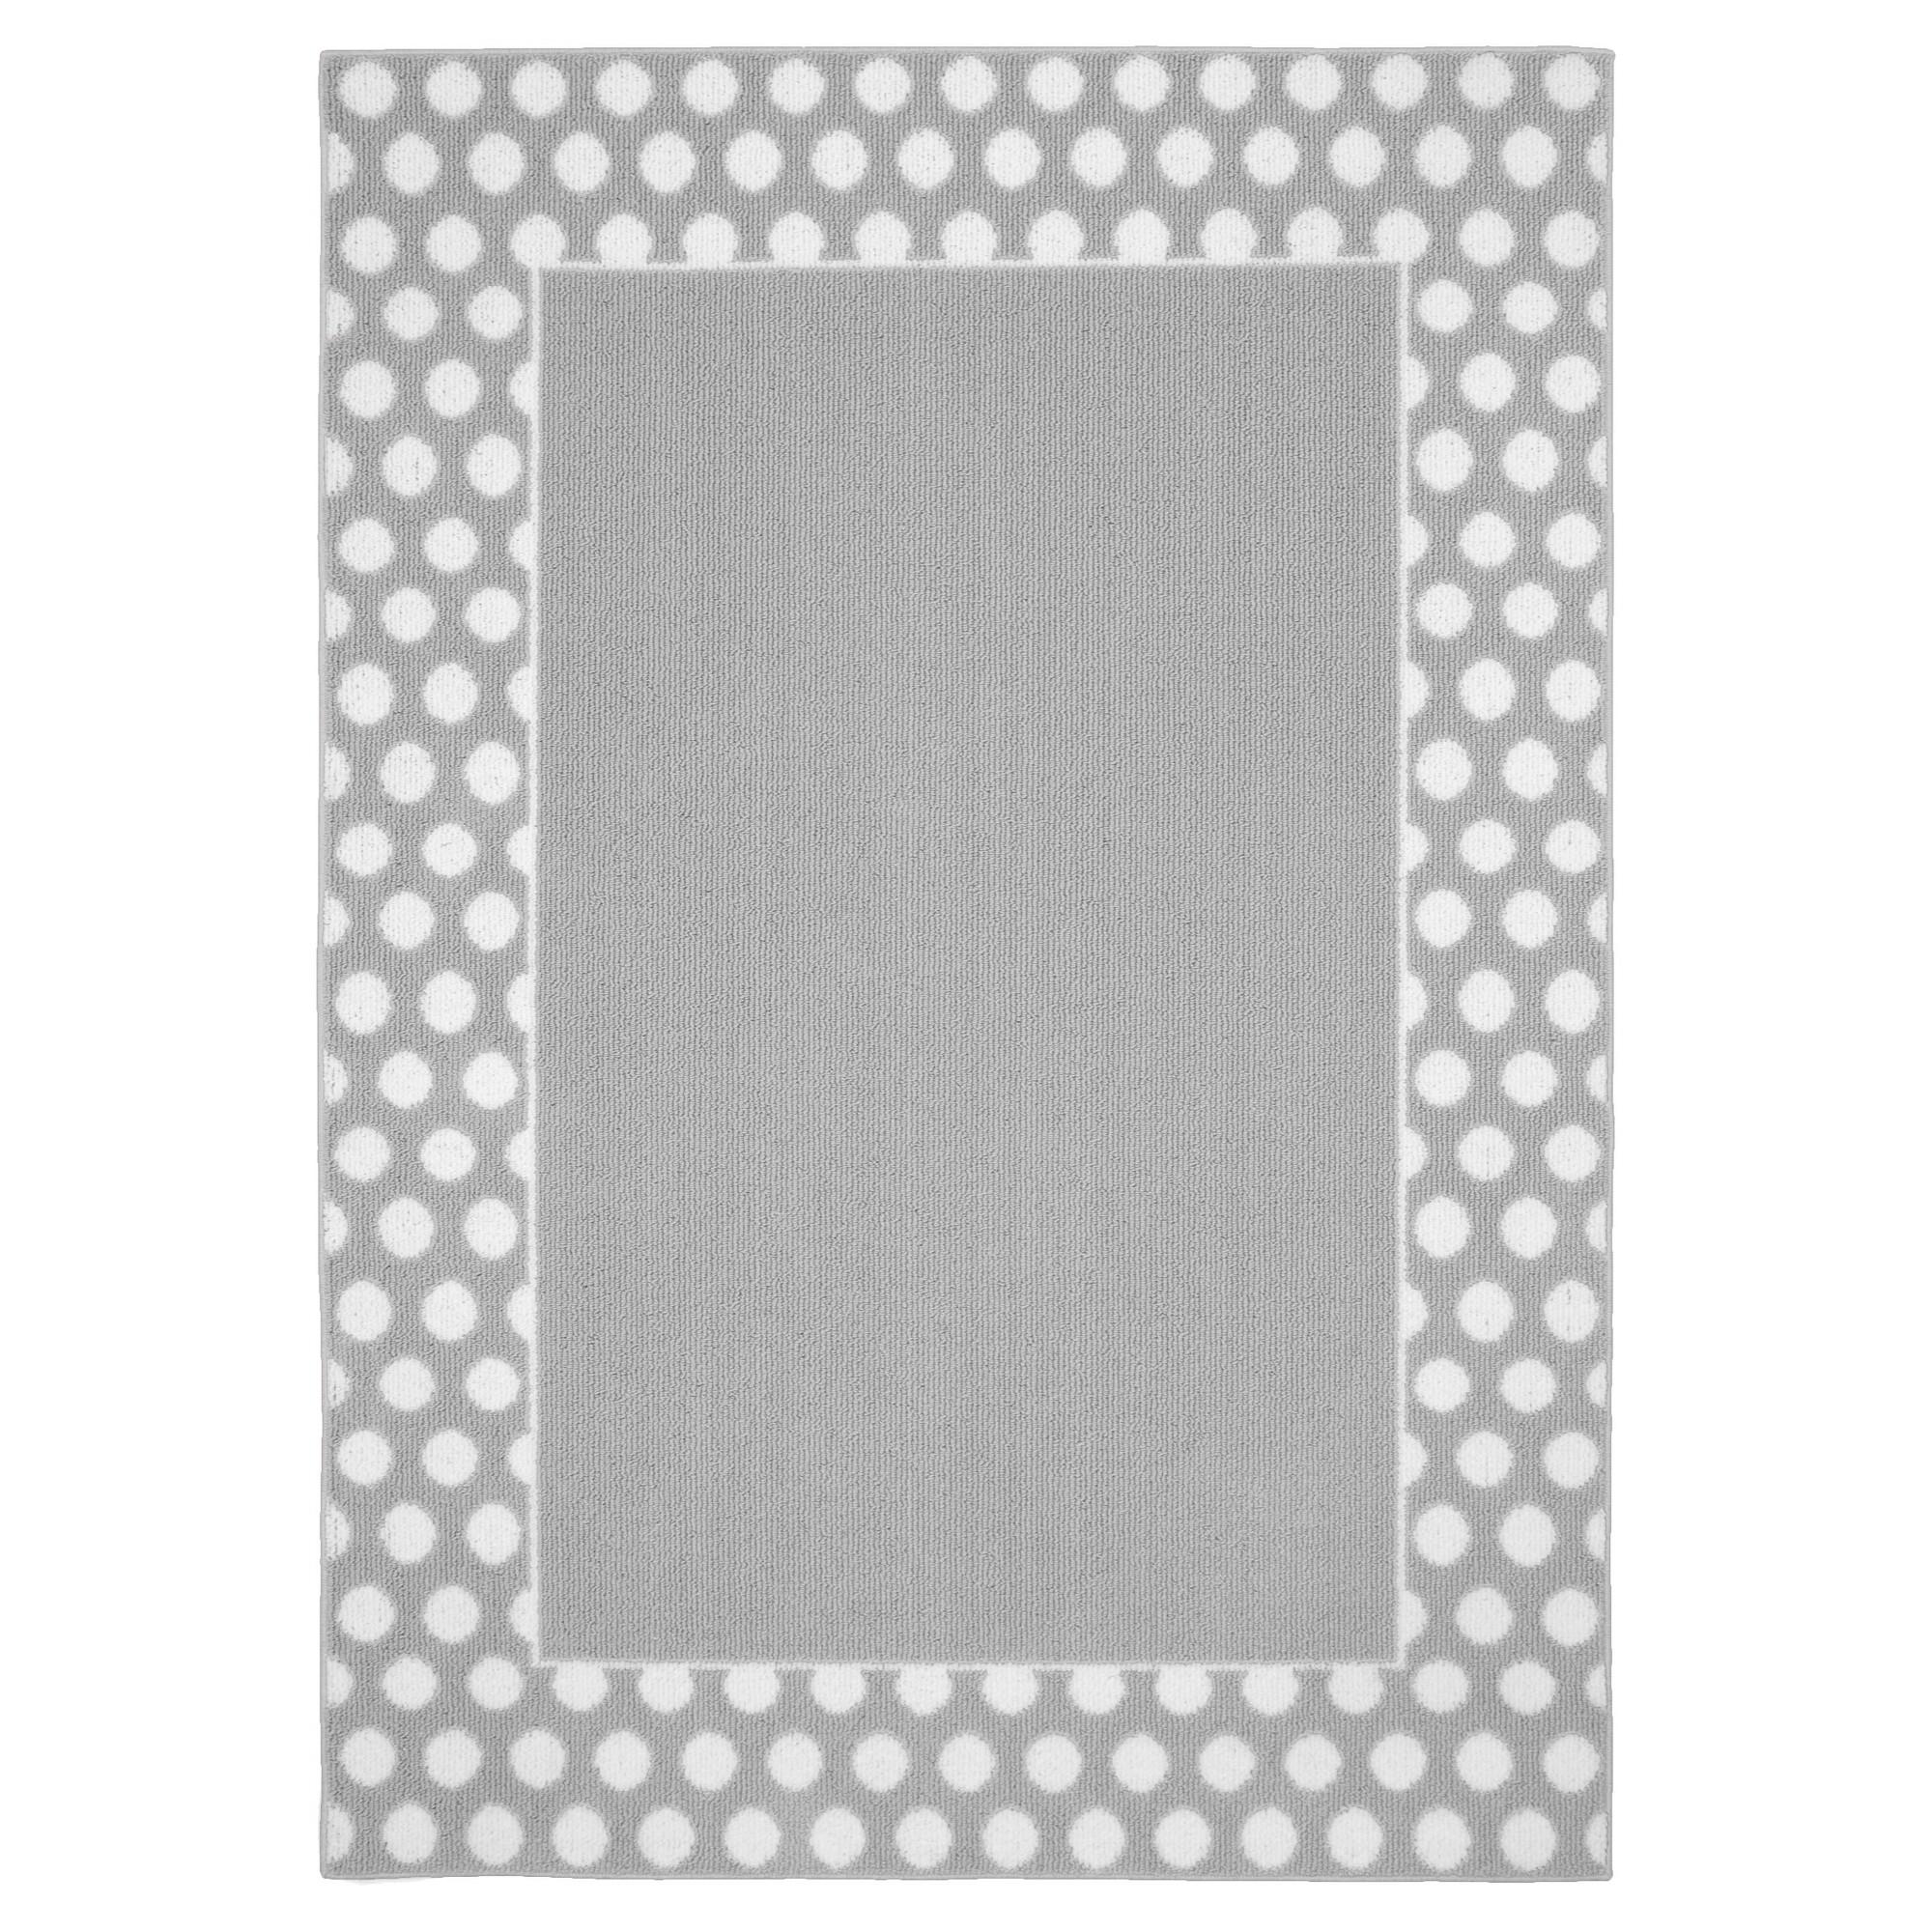 Garland Polka Dot Frame Area Rug Silver White 5 X7 Adult